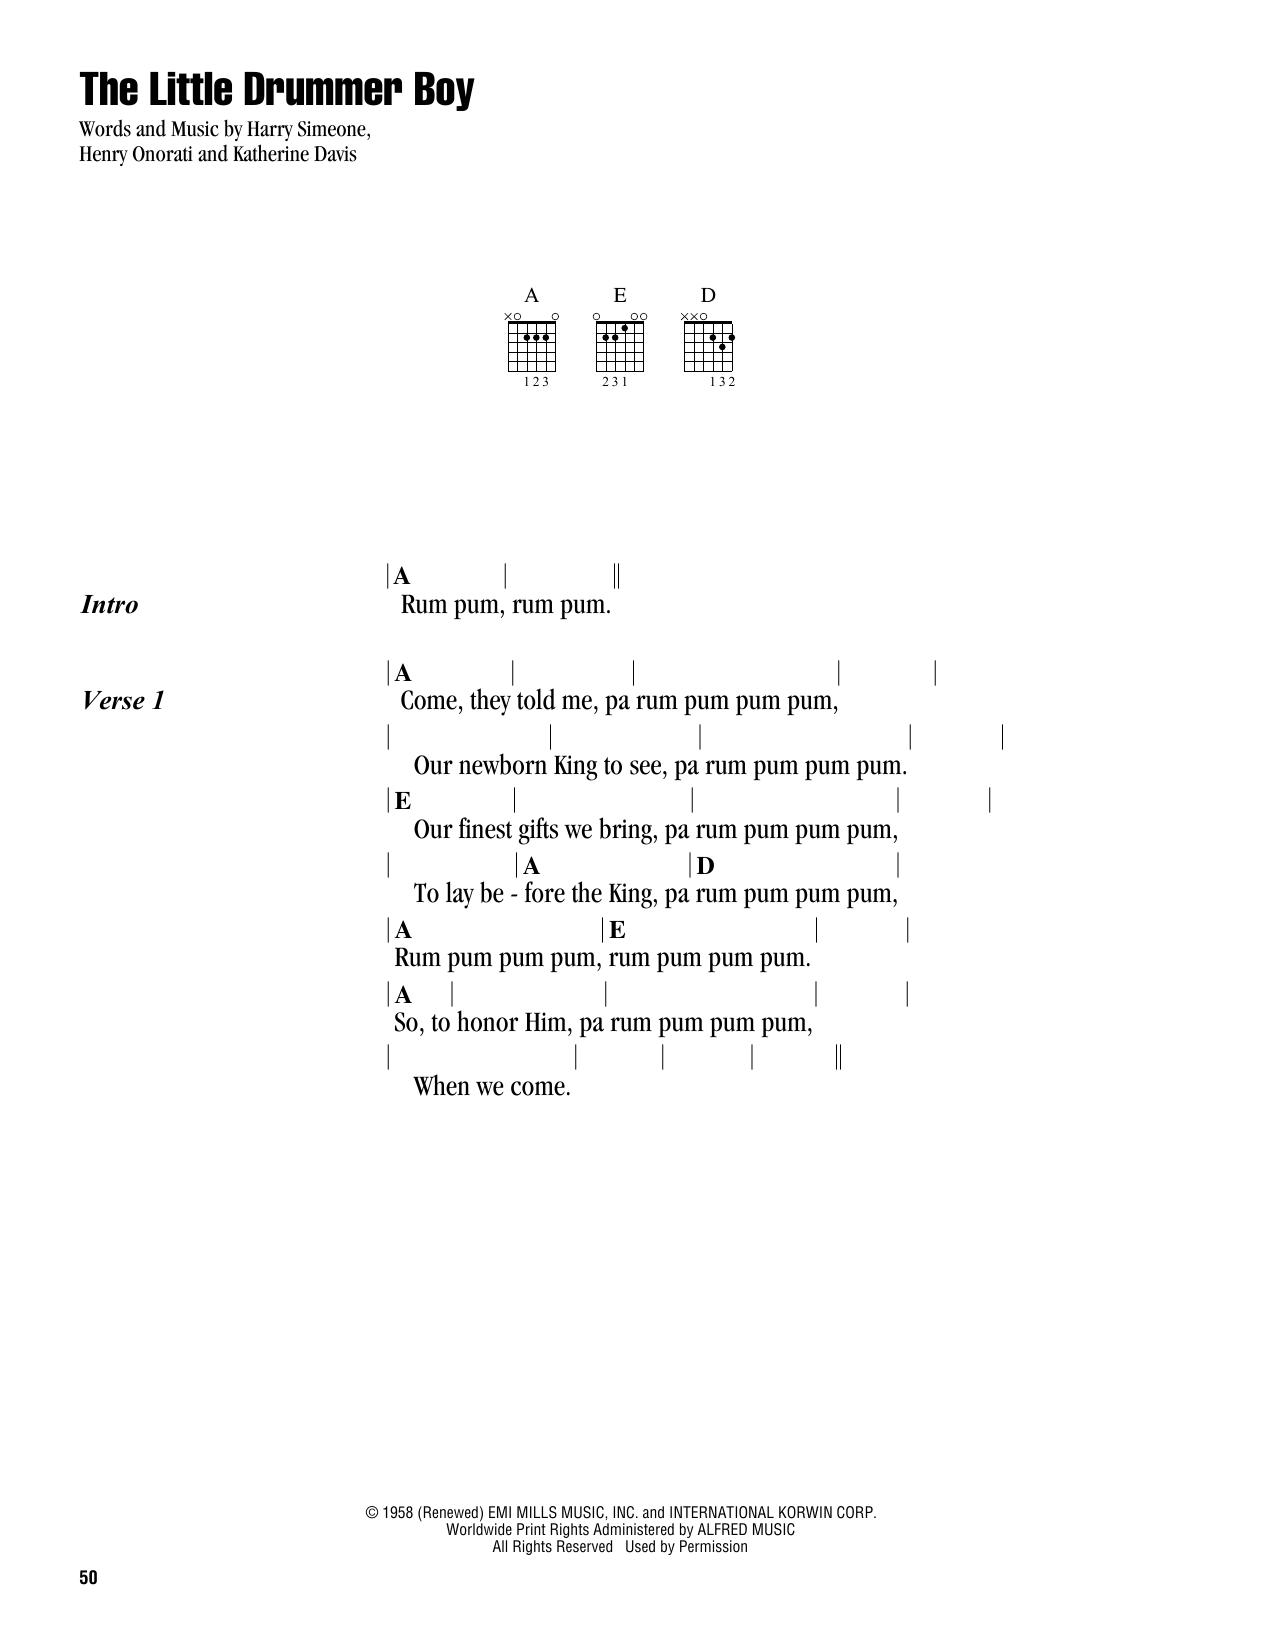 The Little Drummer Boy (Guitar Chords/Lyrics)